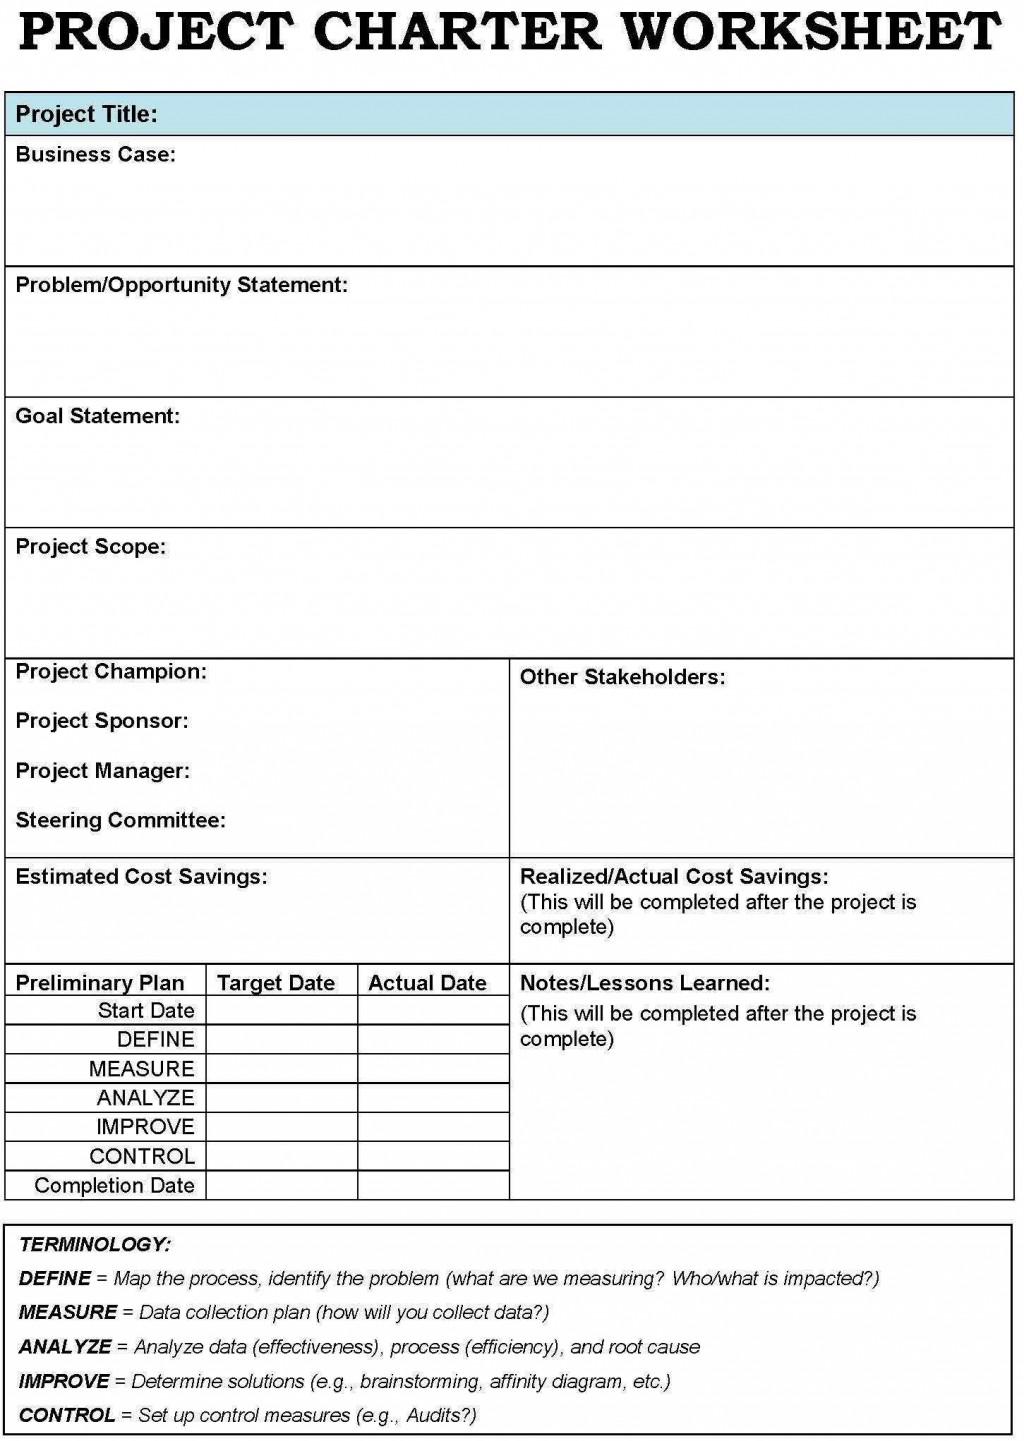 001 Unusual Project Charter Template Excel Inspiration  Lean Pmbok NederlandLarge